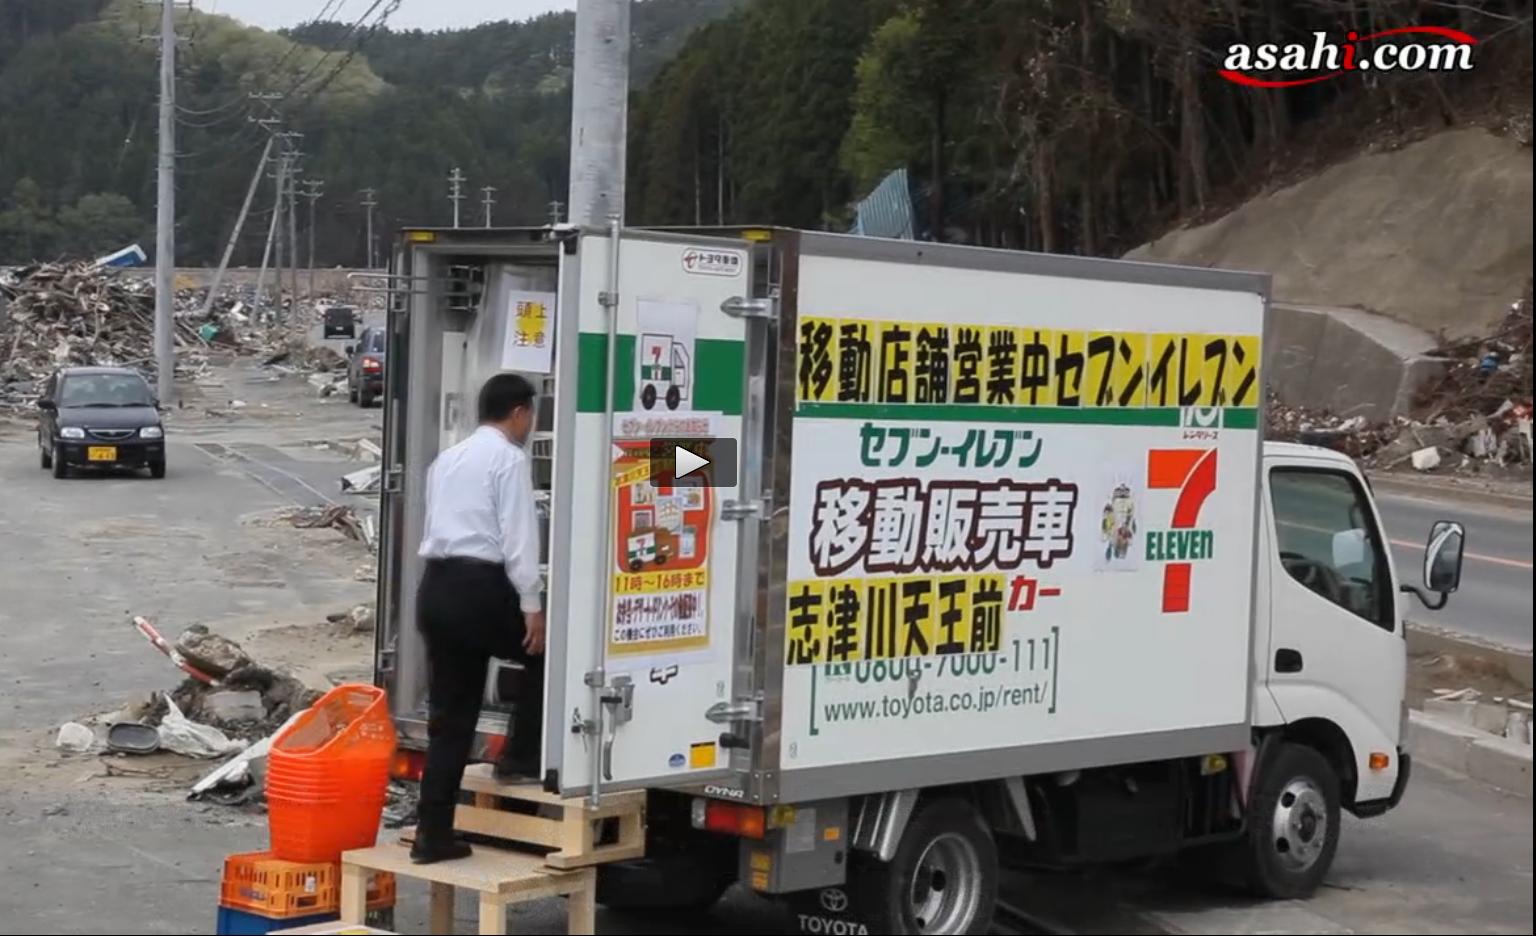 「7-11 truck in japan」的圖片搜尋結果